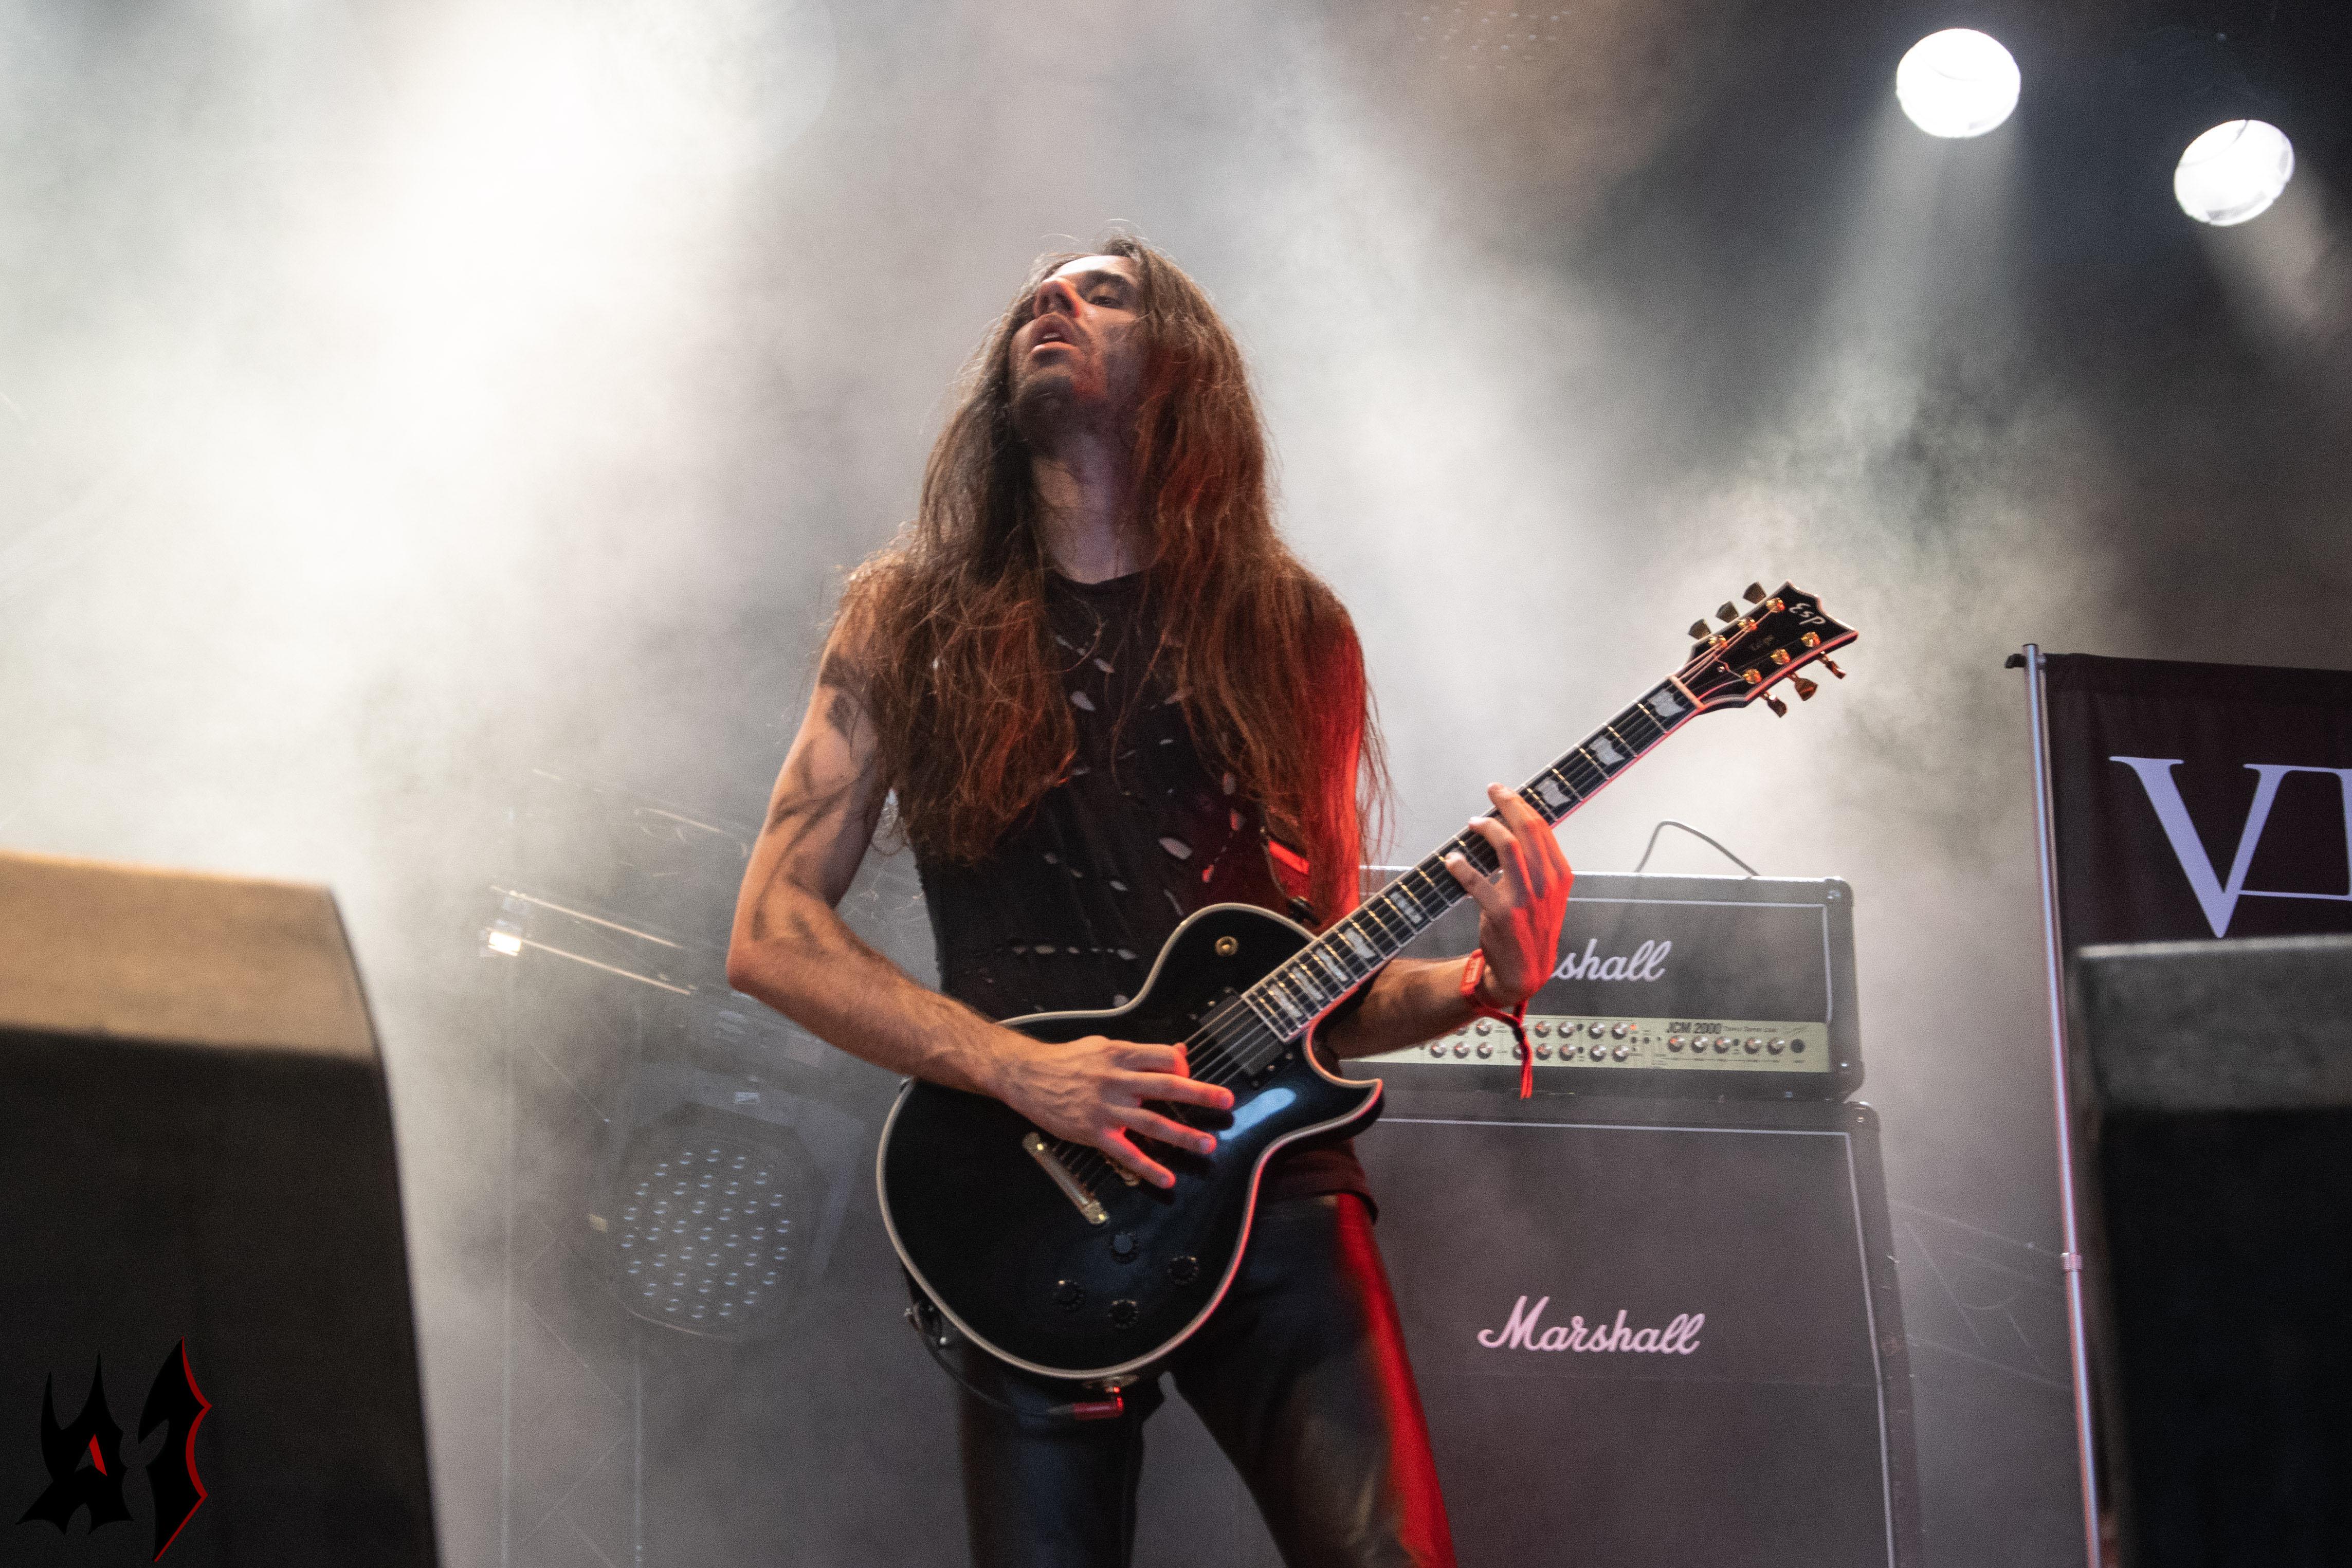 Hellfest - Vltimas - 16